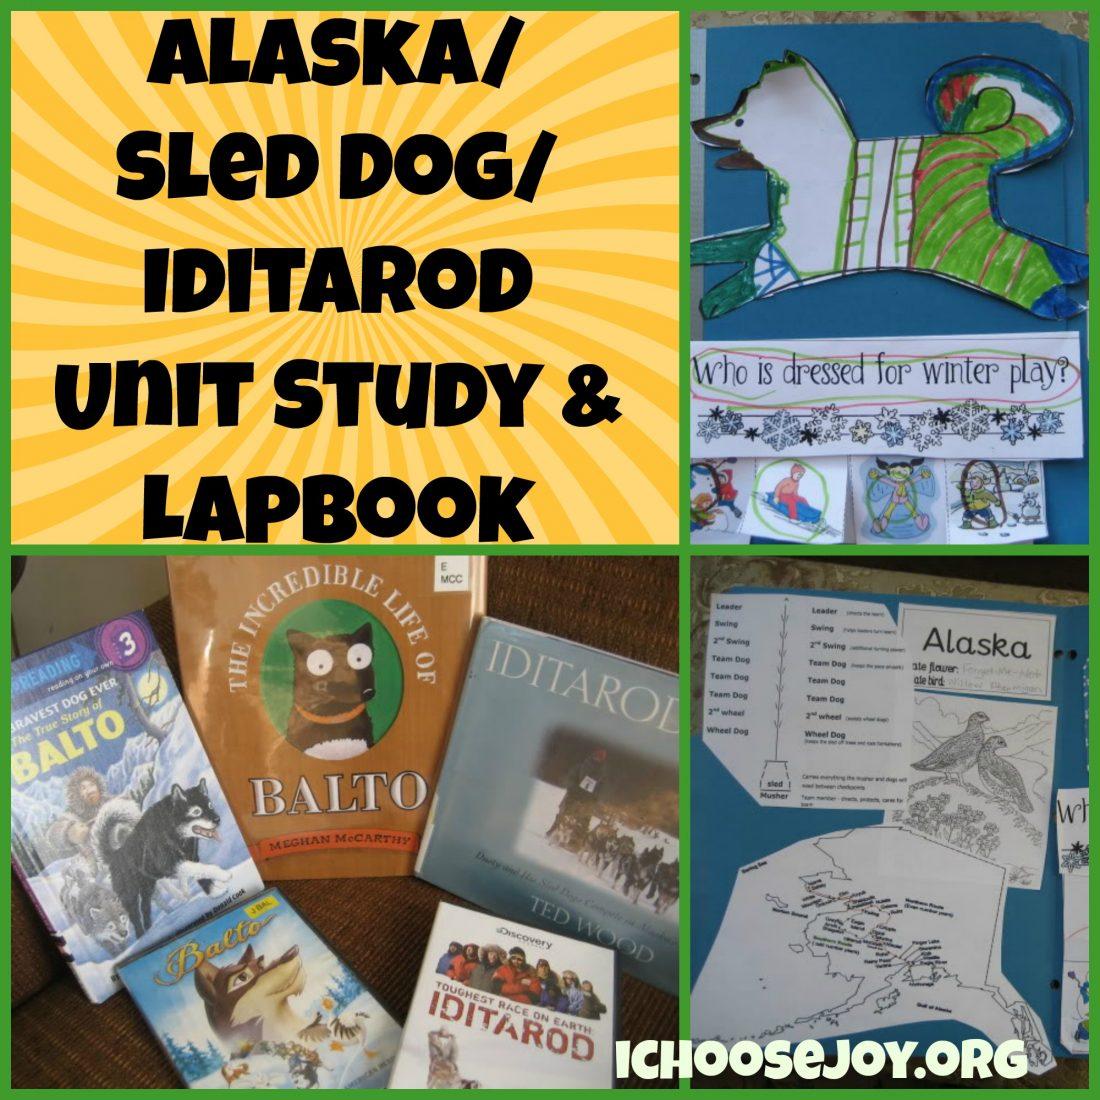 Alaska/ Sled Dog/ Iditarod unit study and lapbook